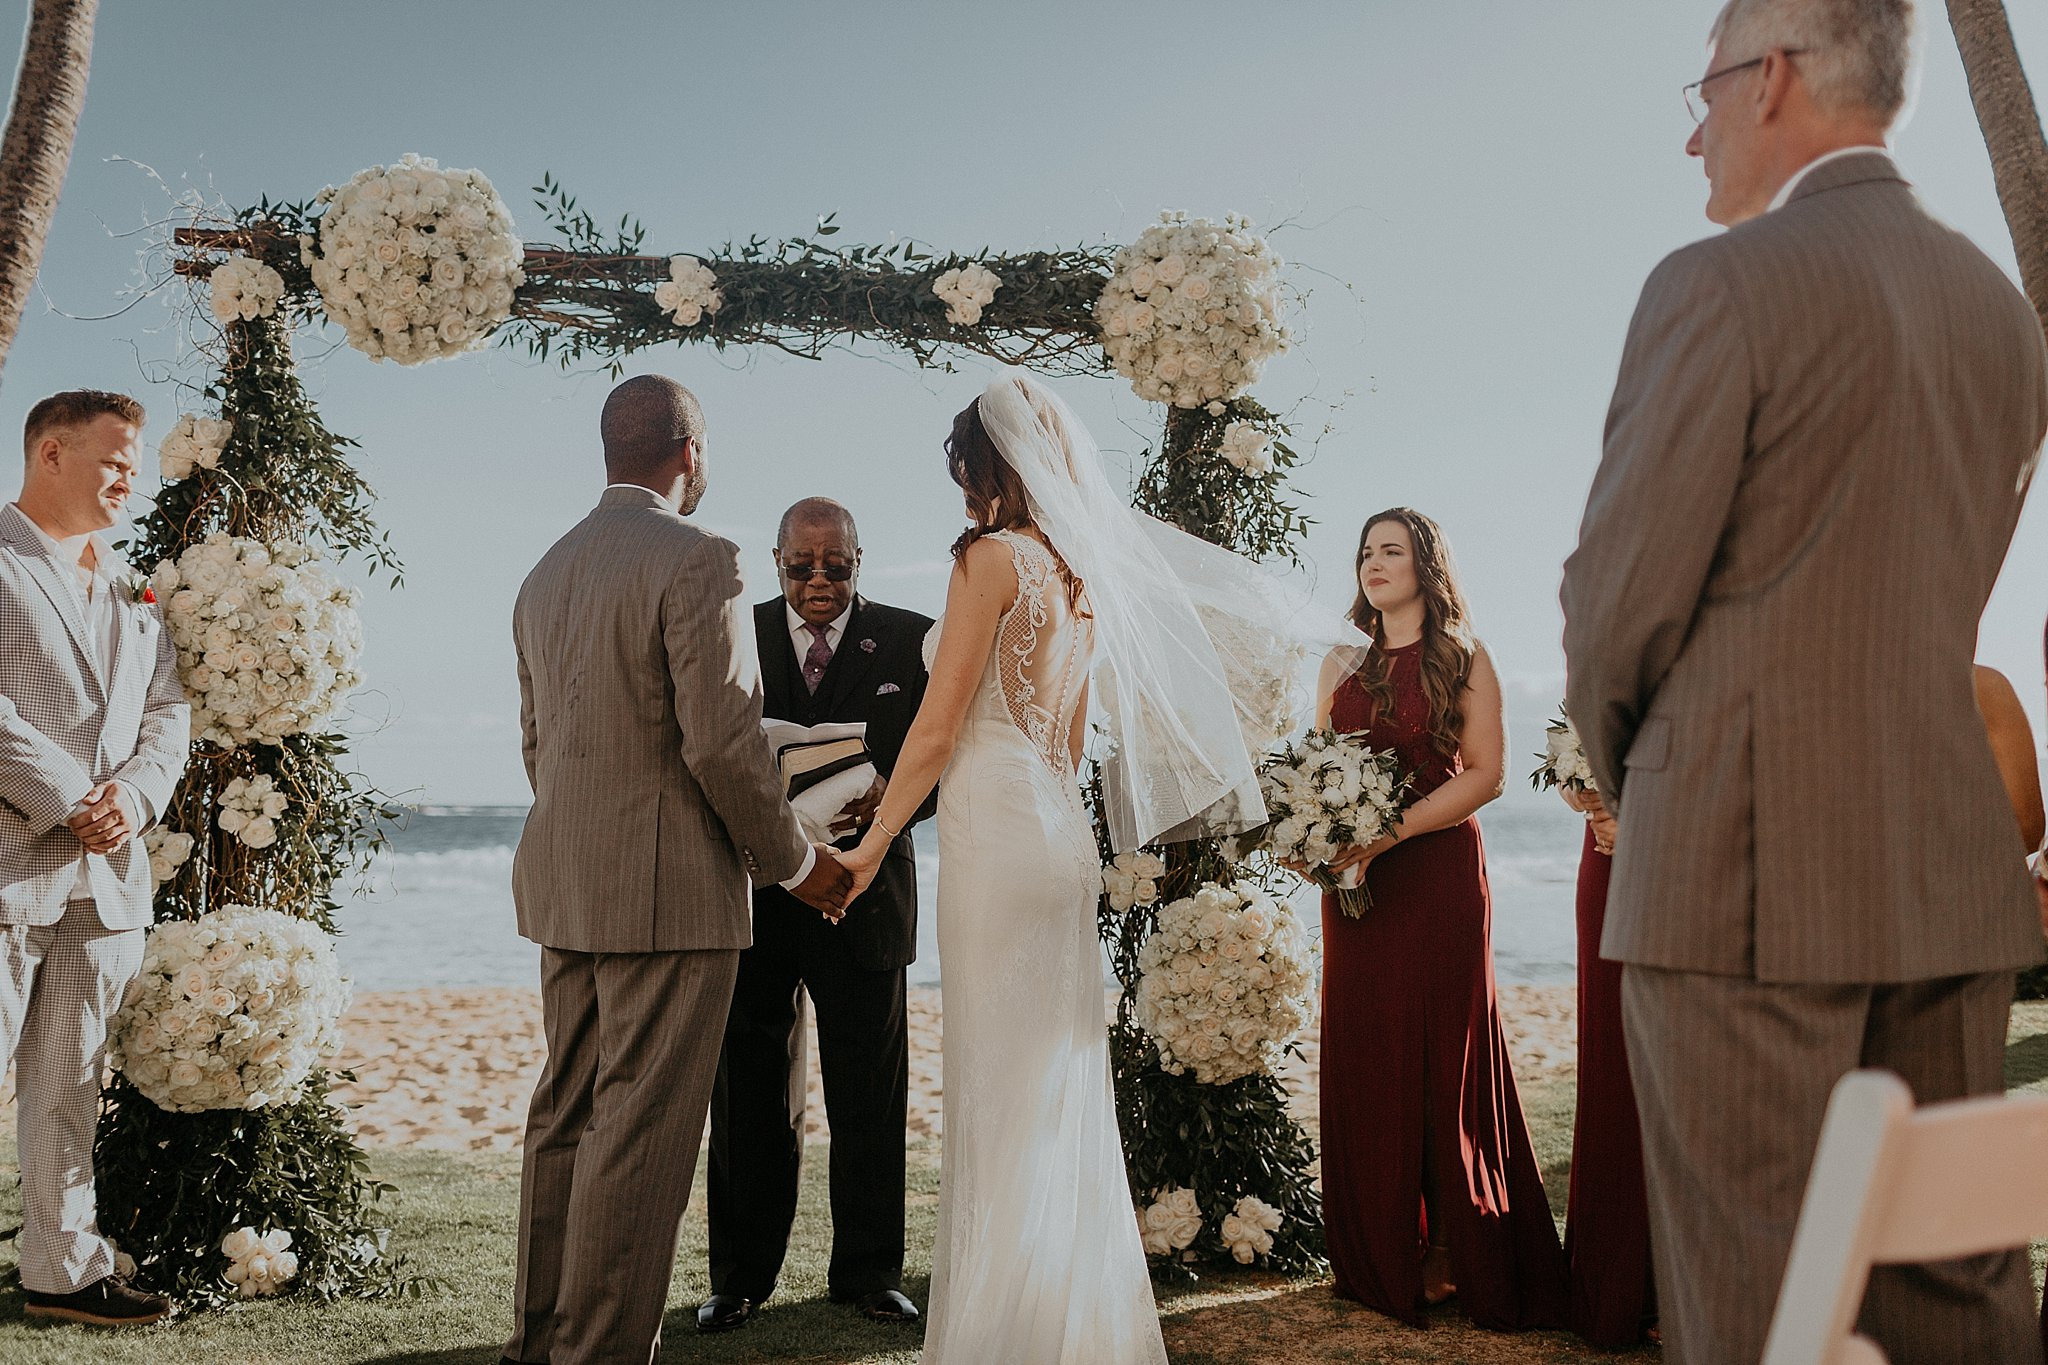 samantha_mcfarlen_bellingham_washington_engagement_photography_seattle_wedding_photographer_0205.jpg